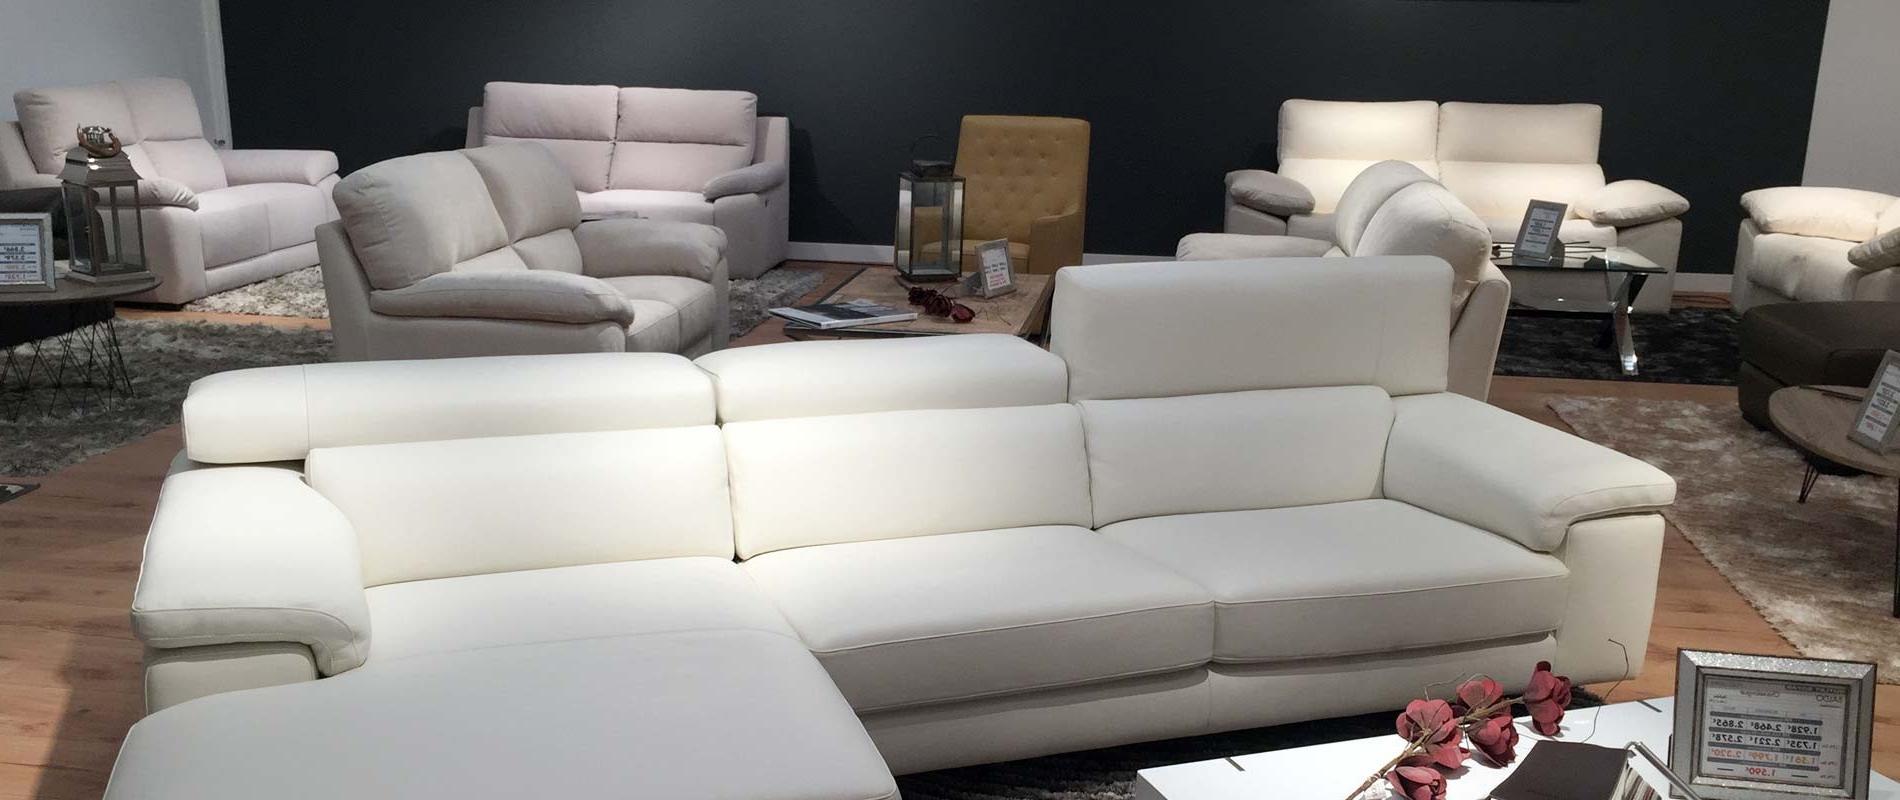 Sofas Outlet Madrid X8d1 Prar sofas Baratos Madrid Outlet Mis Muebles Establece Tienda sof